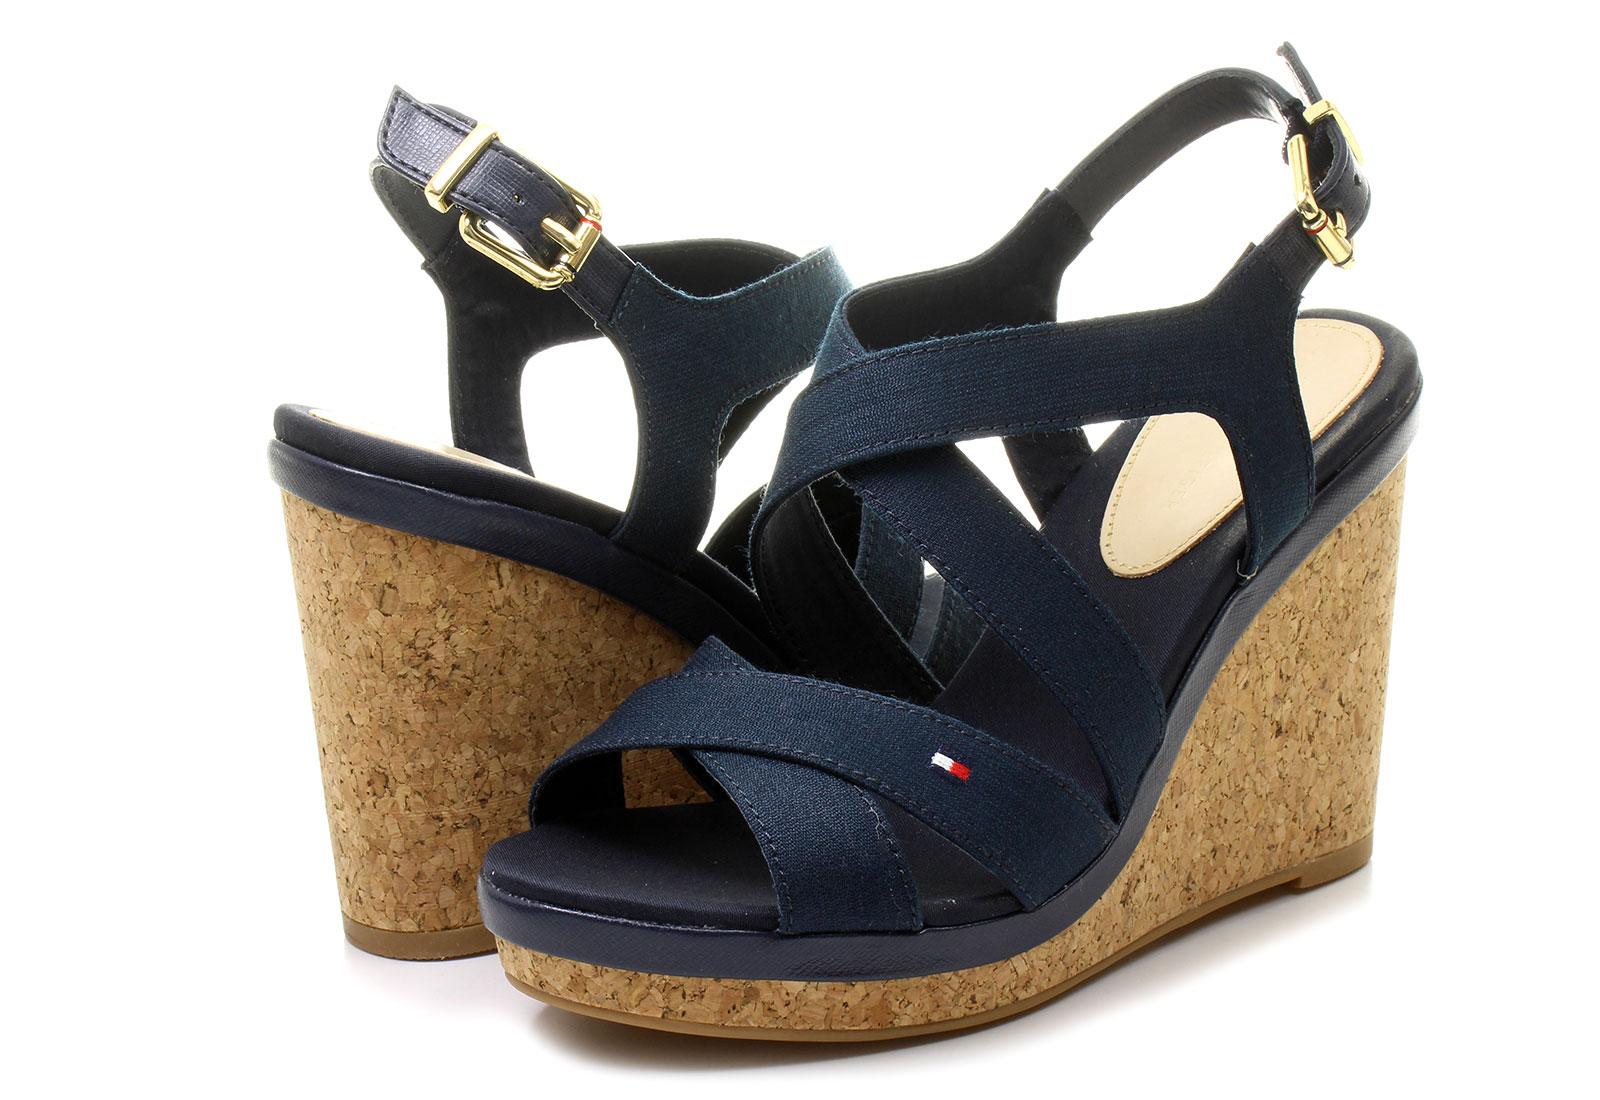 tommy hilfiger platforma plave sandale elena 8d office shoes online  trgovina obu e 4b3dec93e3